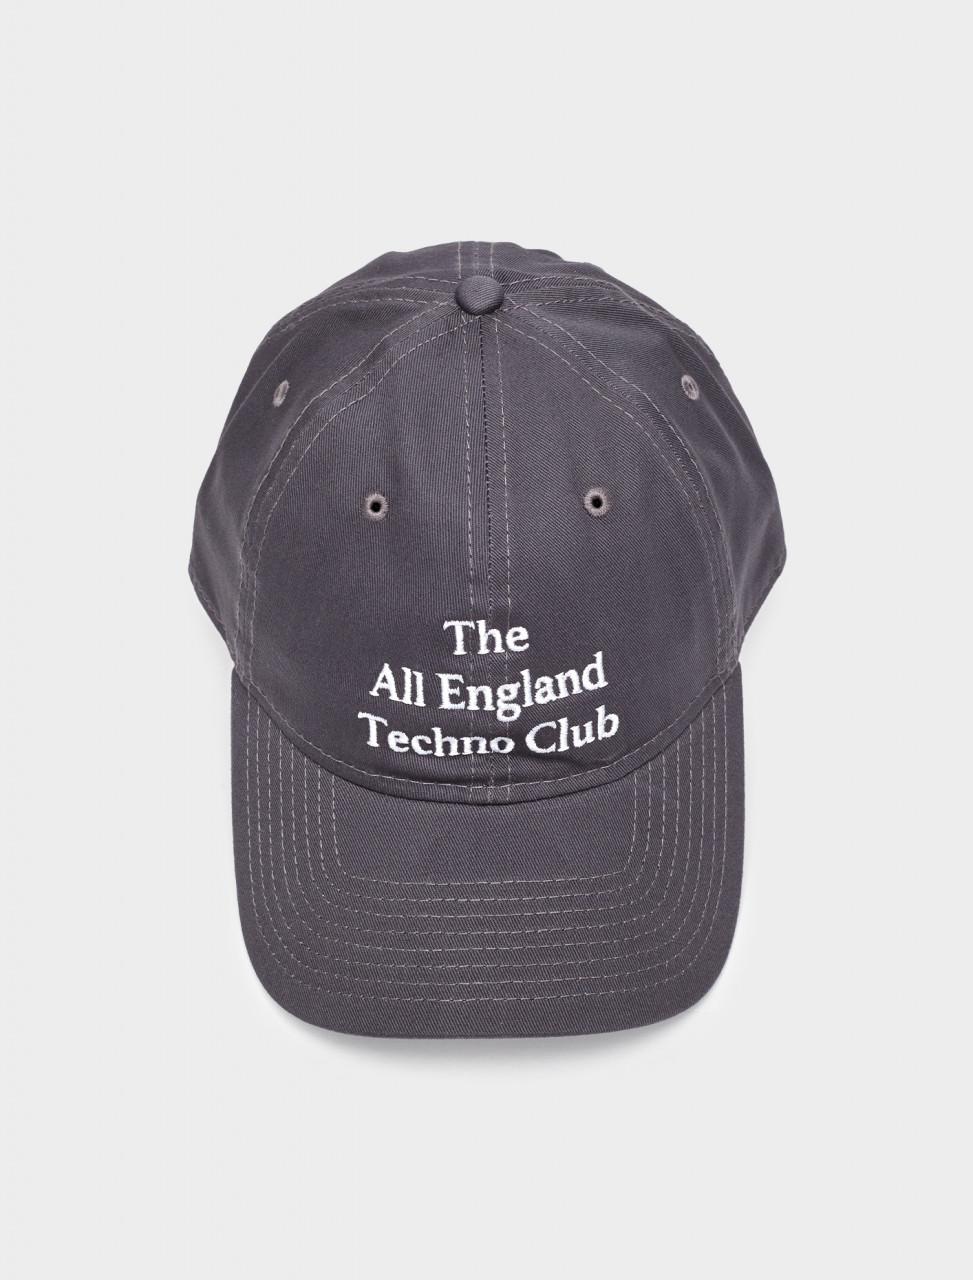 AETC IDEA BOOKS THE ALL ENGLAND TECHNO CLUB CAP